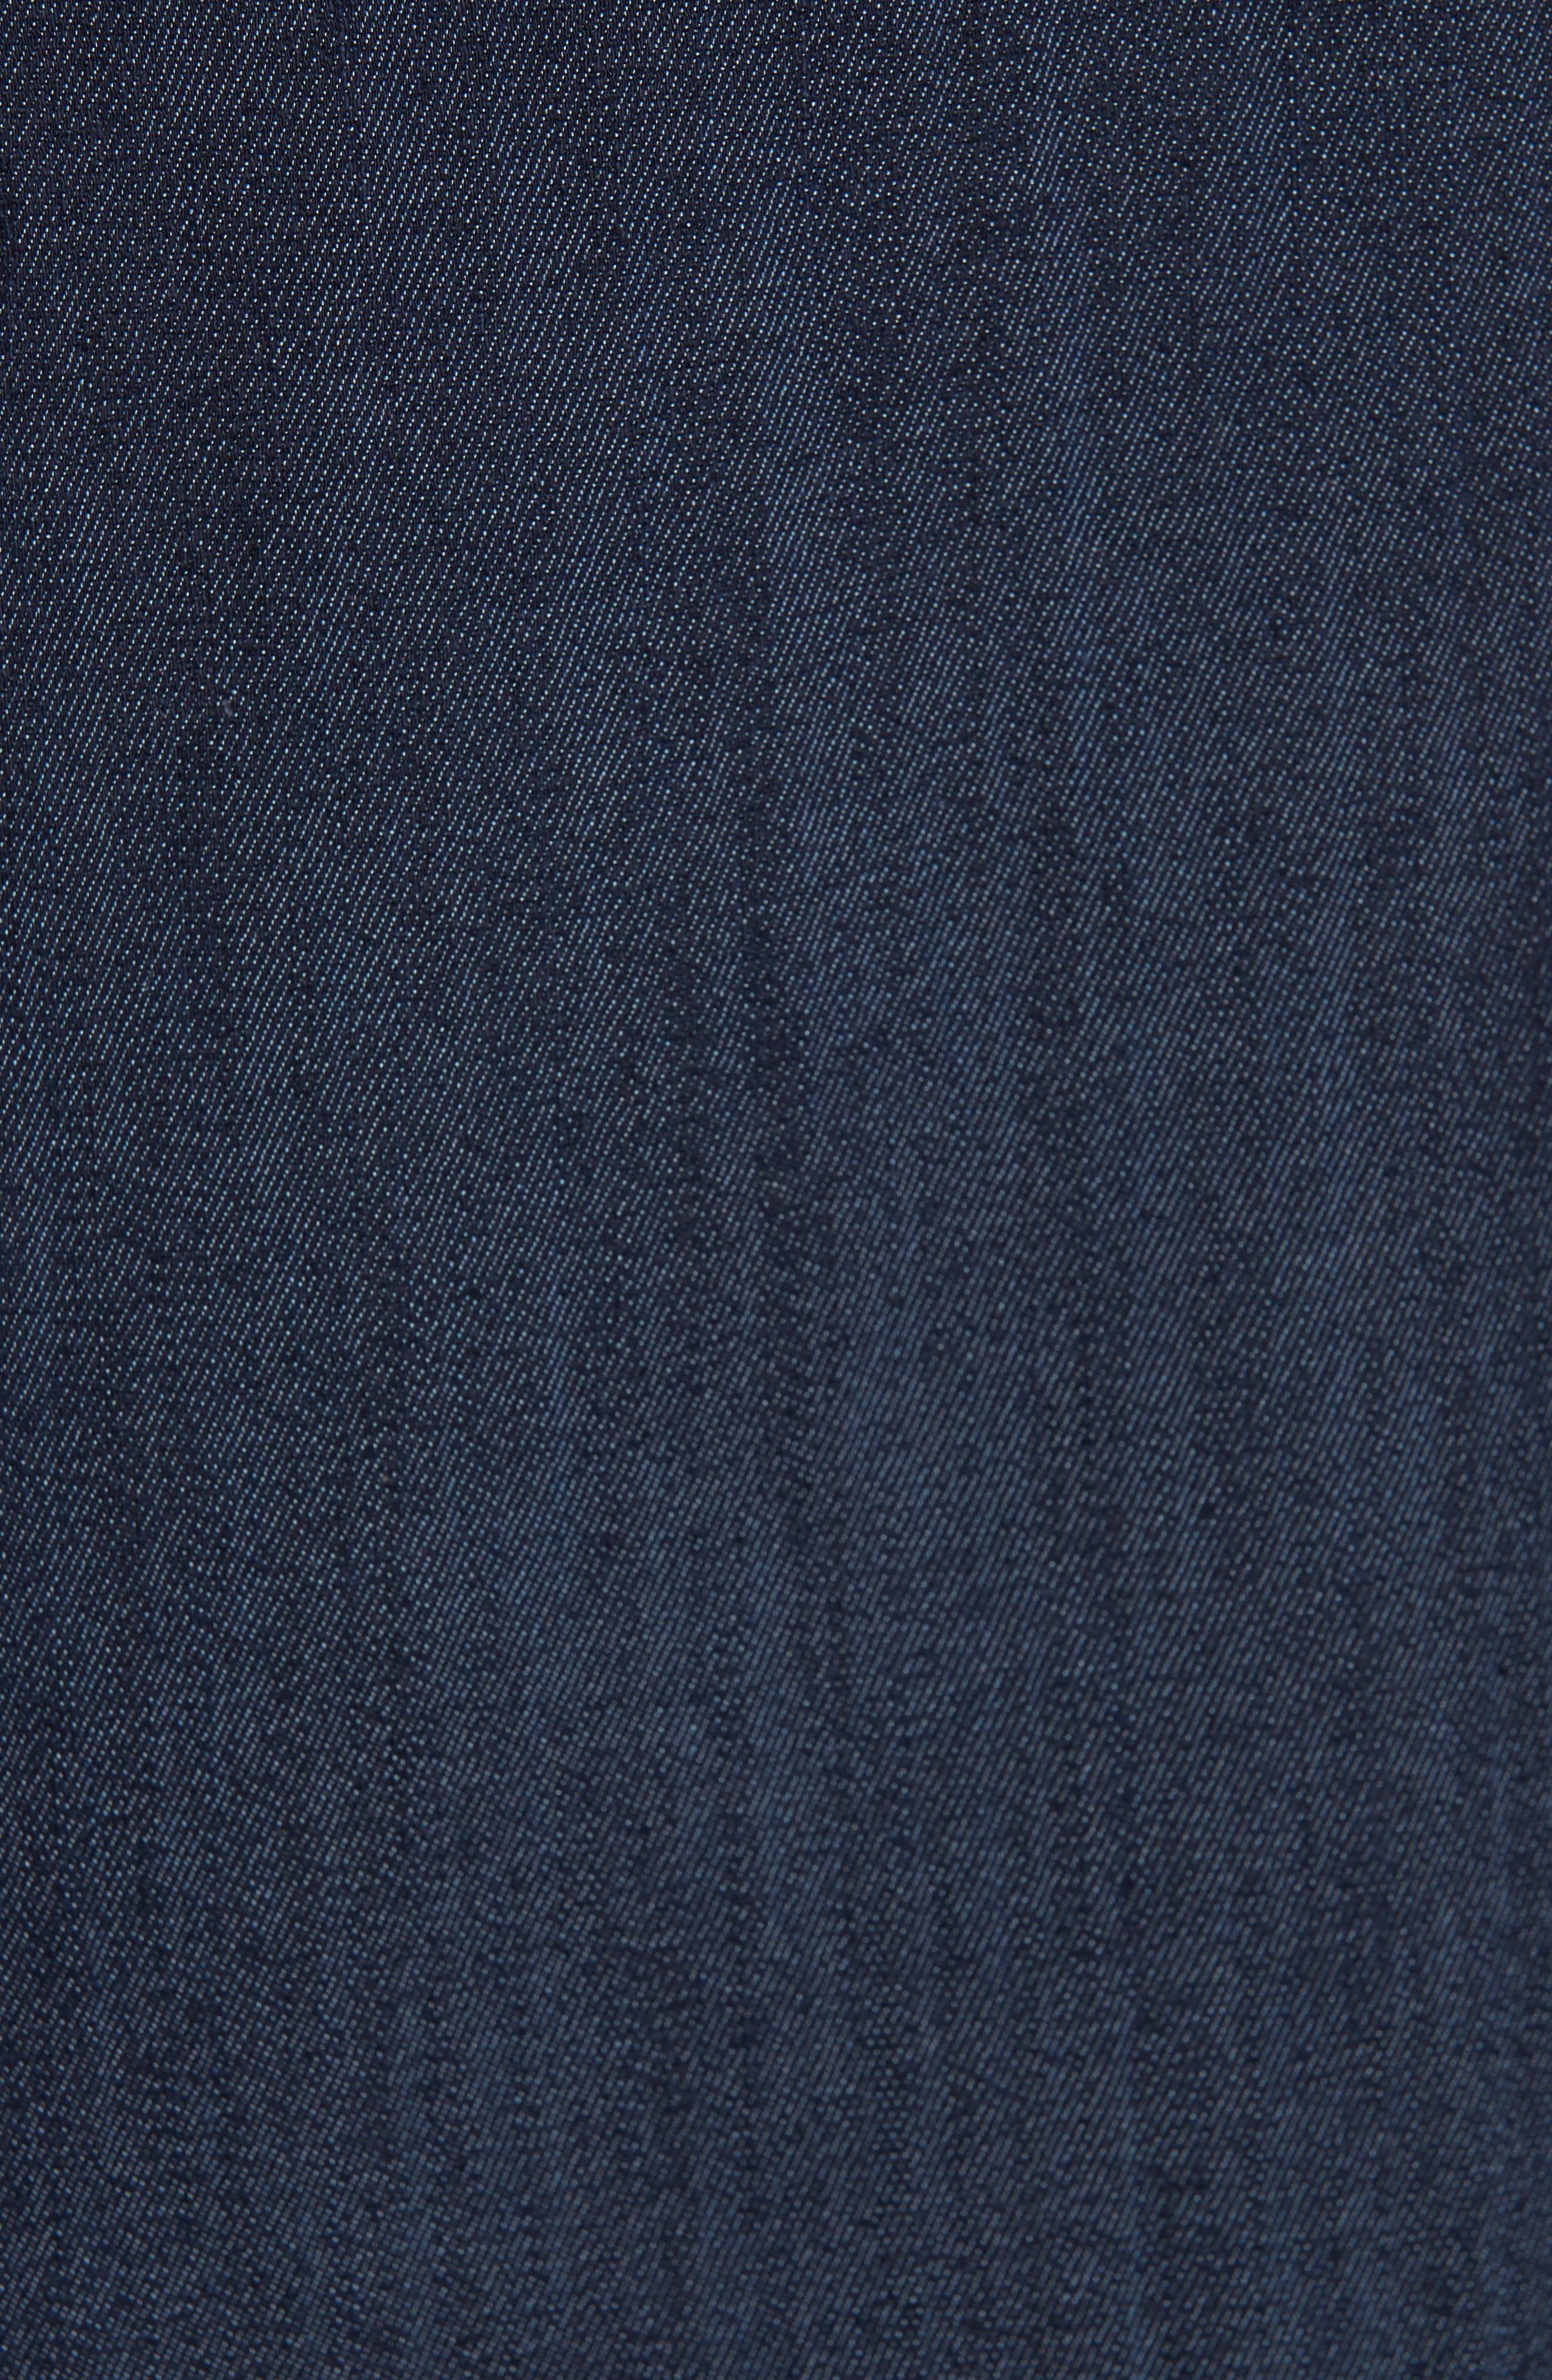 Ashton Dress,                             Alternate thumbnail 5, color,                             INDIGO